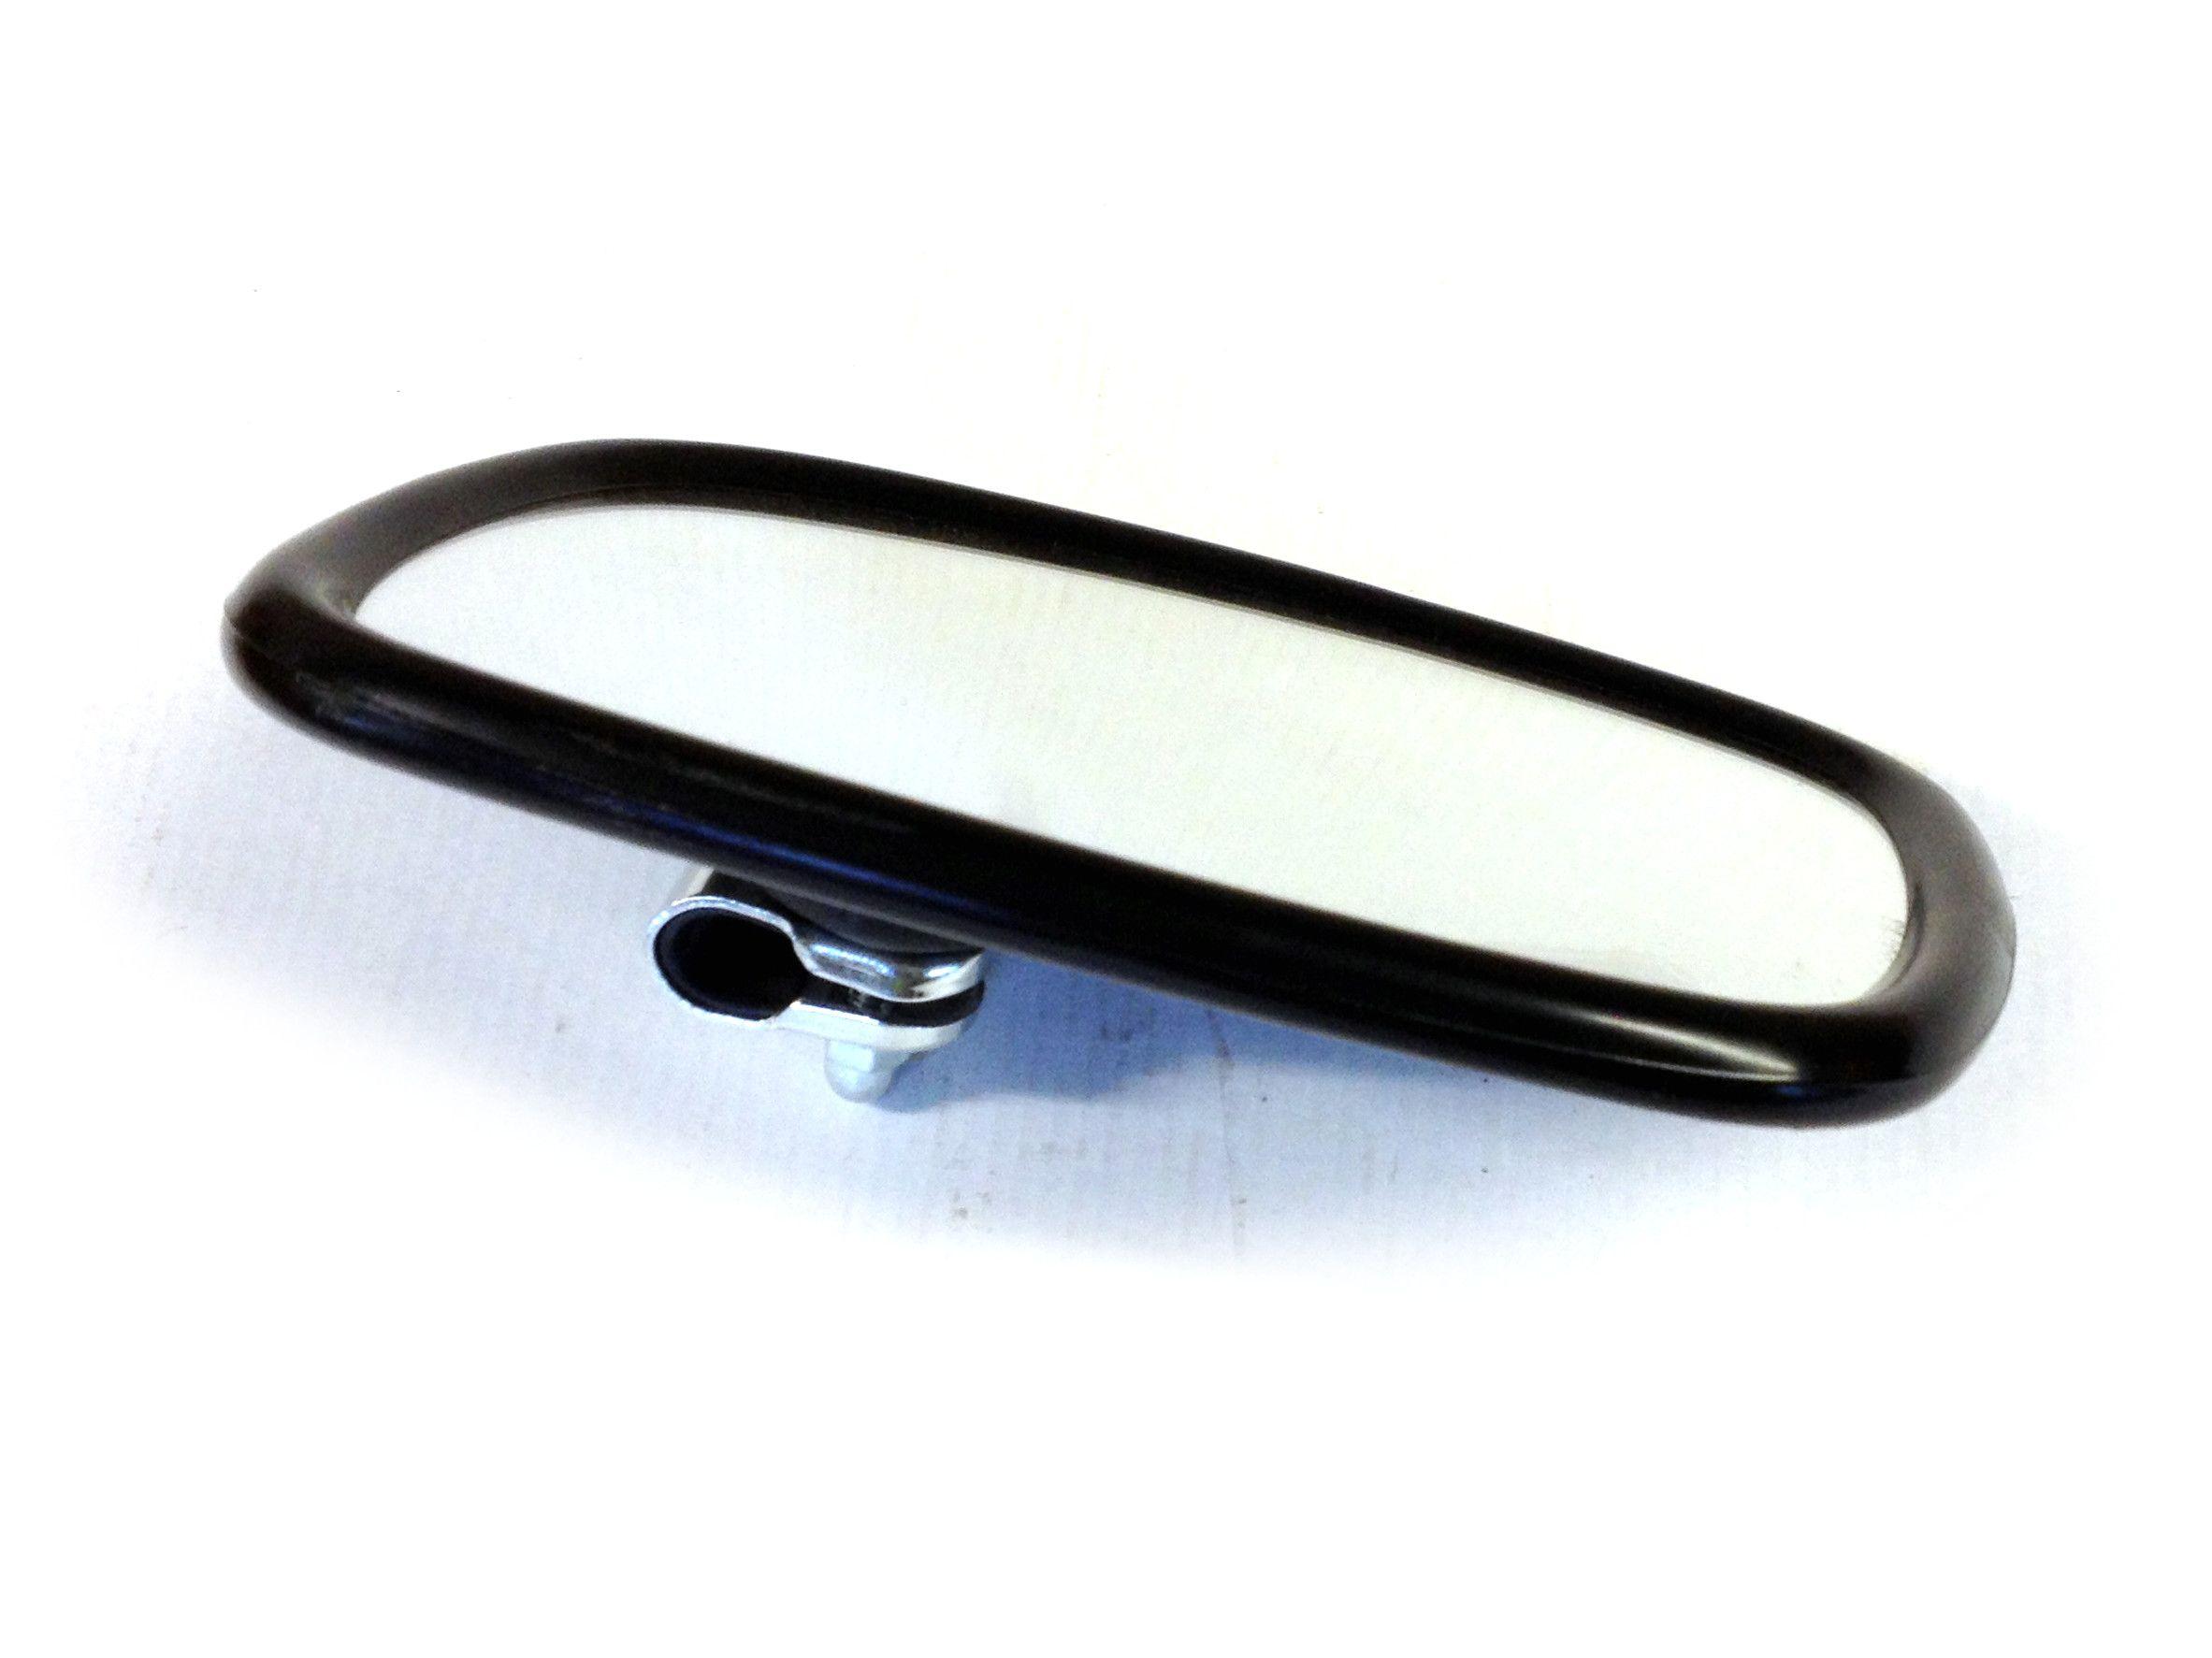 Mirror head - 7in x 5in convex glass